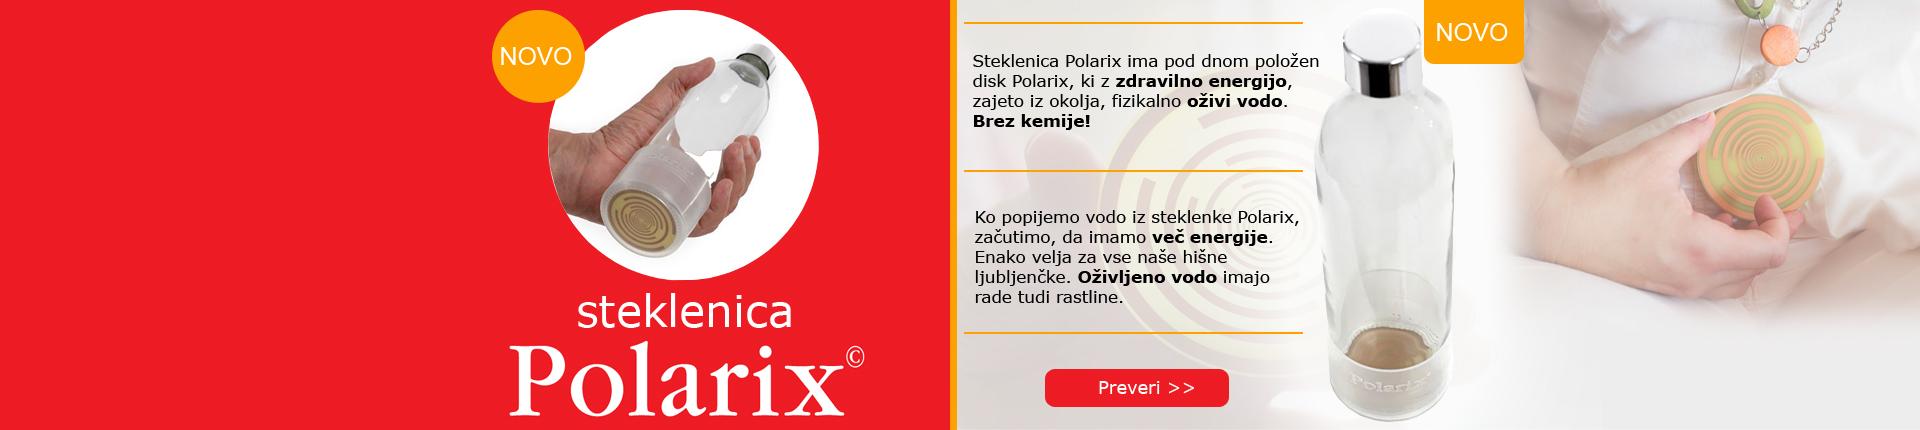 Polarix steklenica